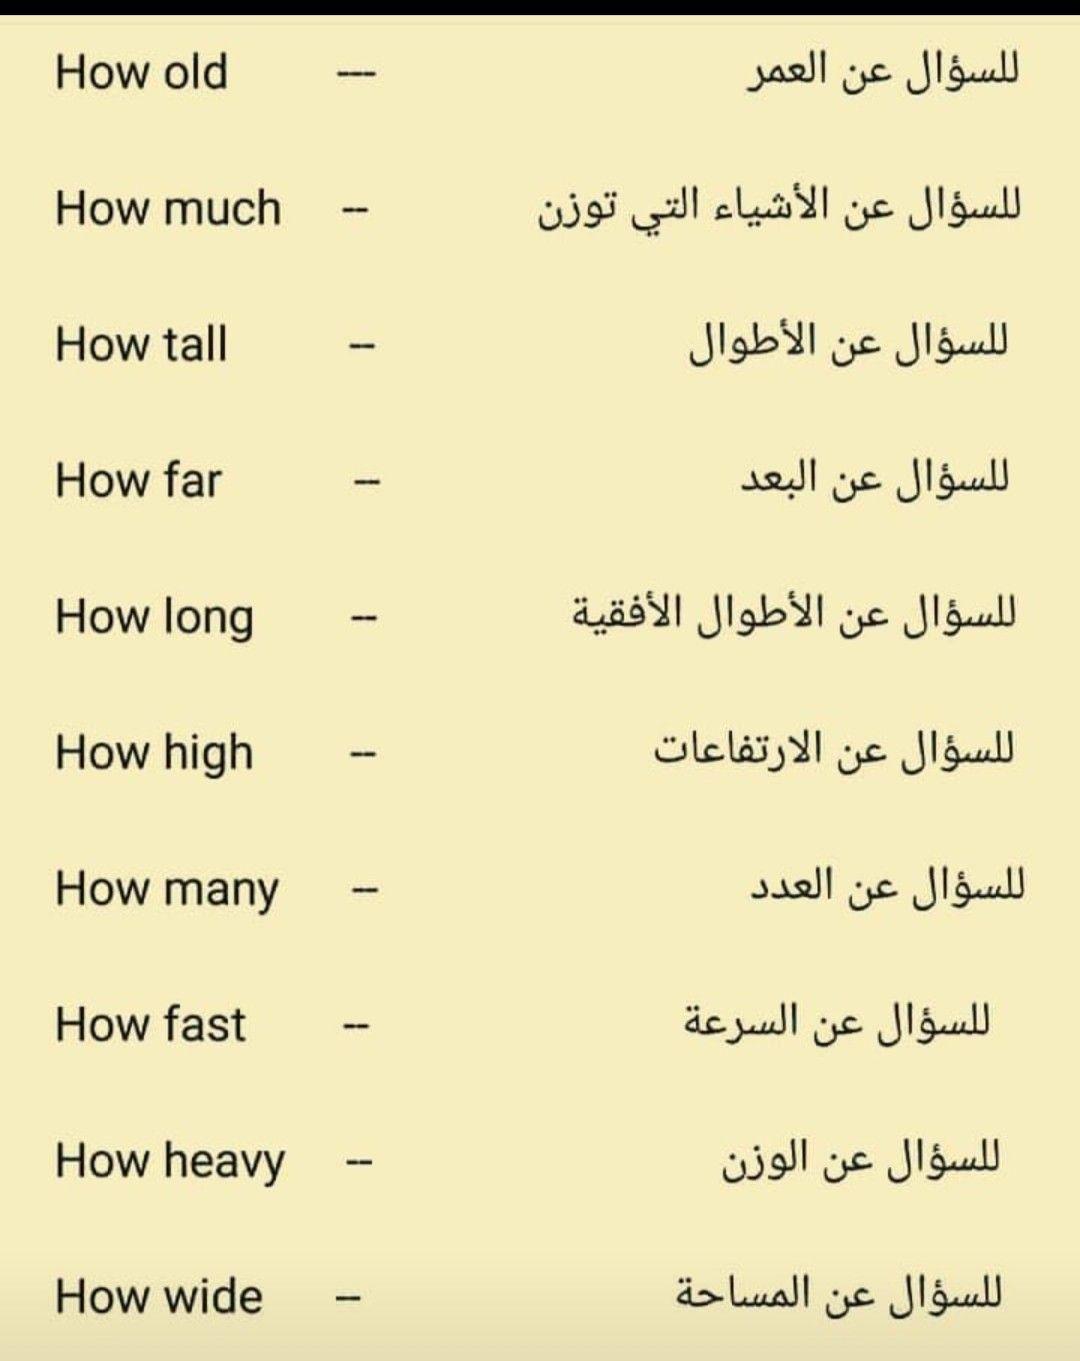 Pin By Deovi On لغة انجليزية In 2020 English Language Learning Grammar English Words Learn Arabic Language